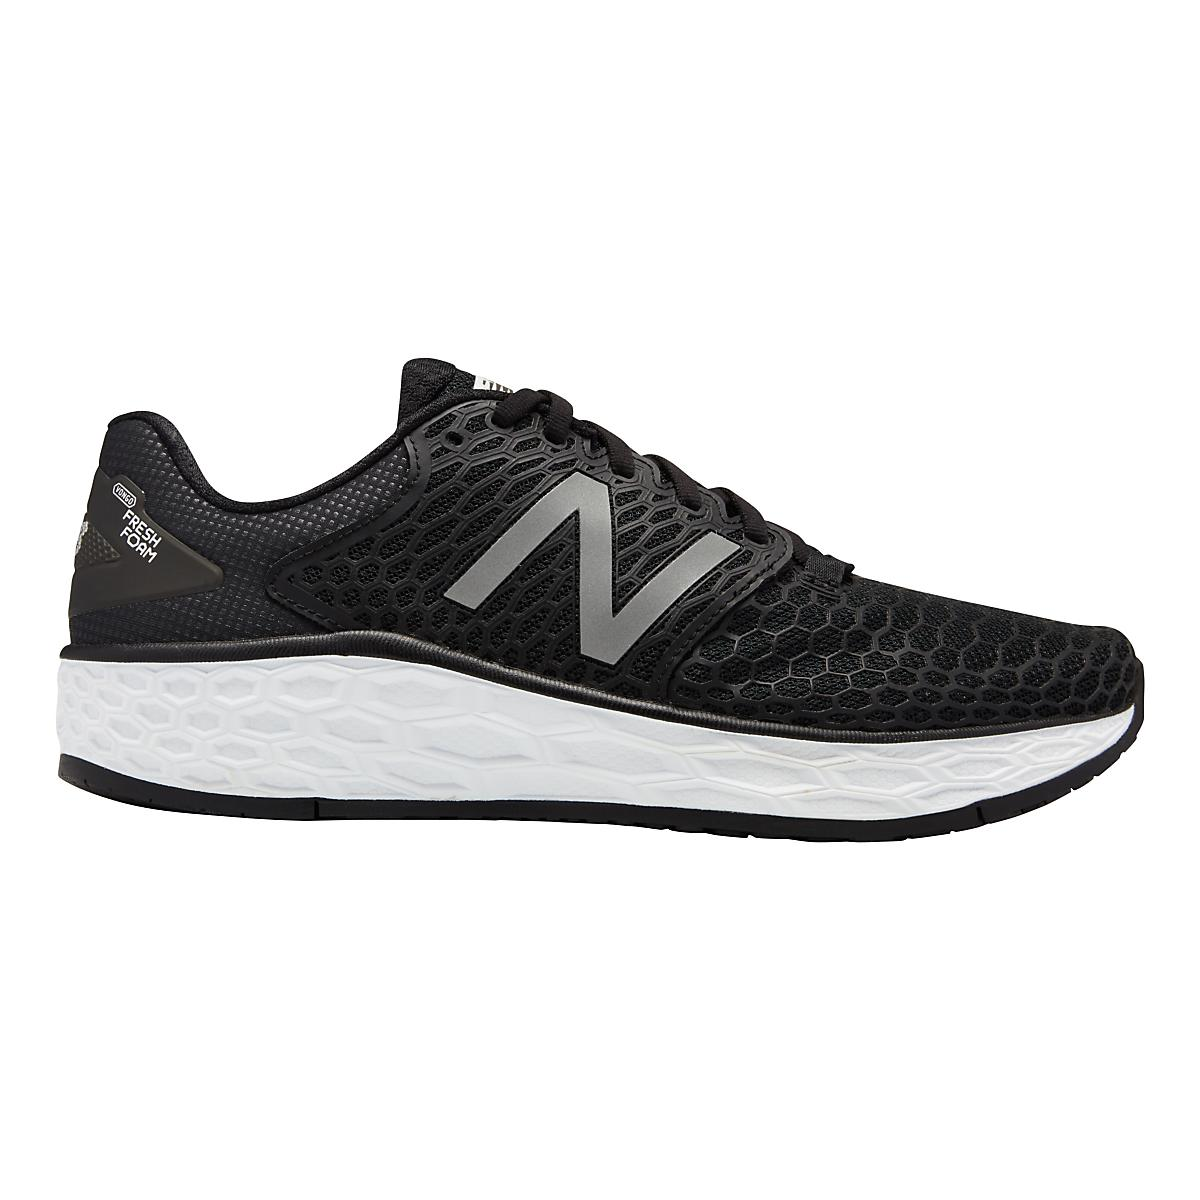 Mens New Balance Fresh Foam Vongo v3 Running Shoe at Road Runner Sports 1ff6058ad00